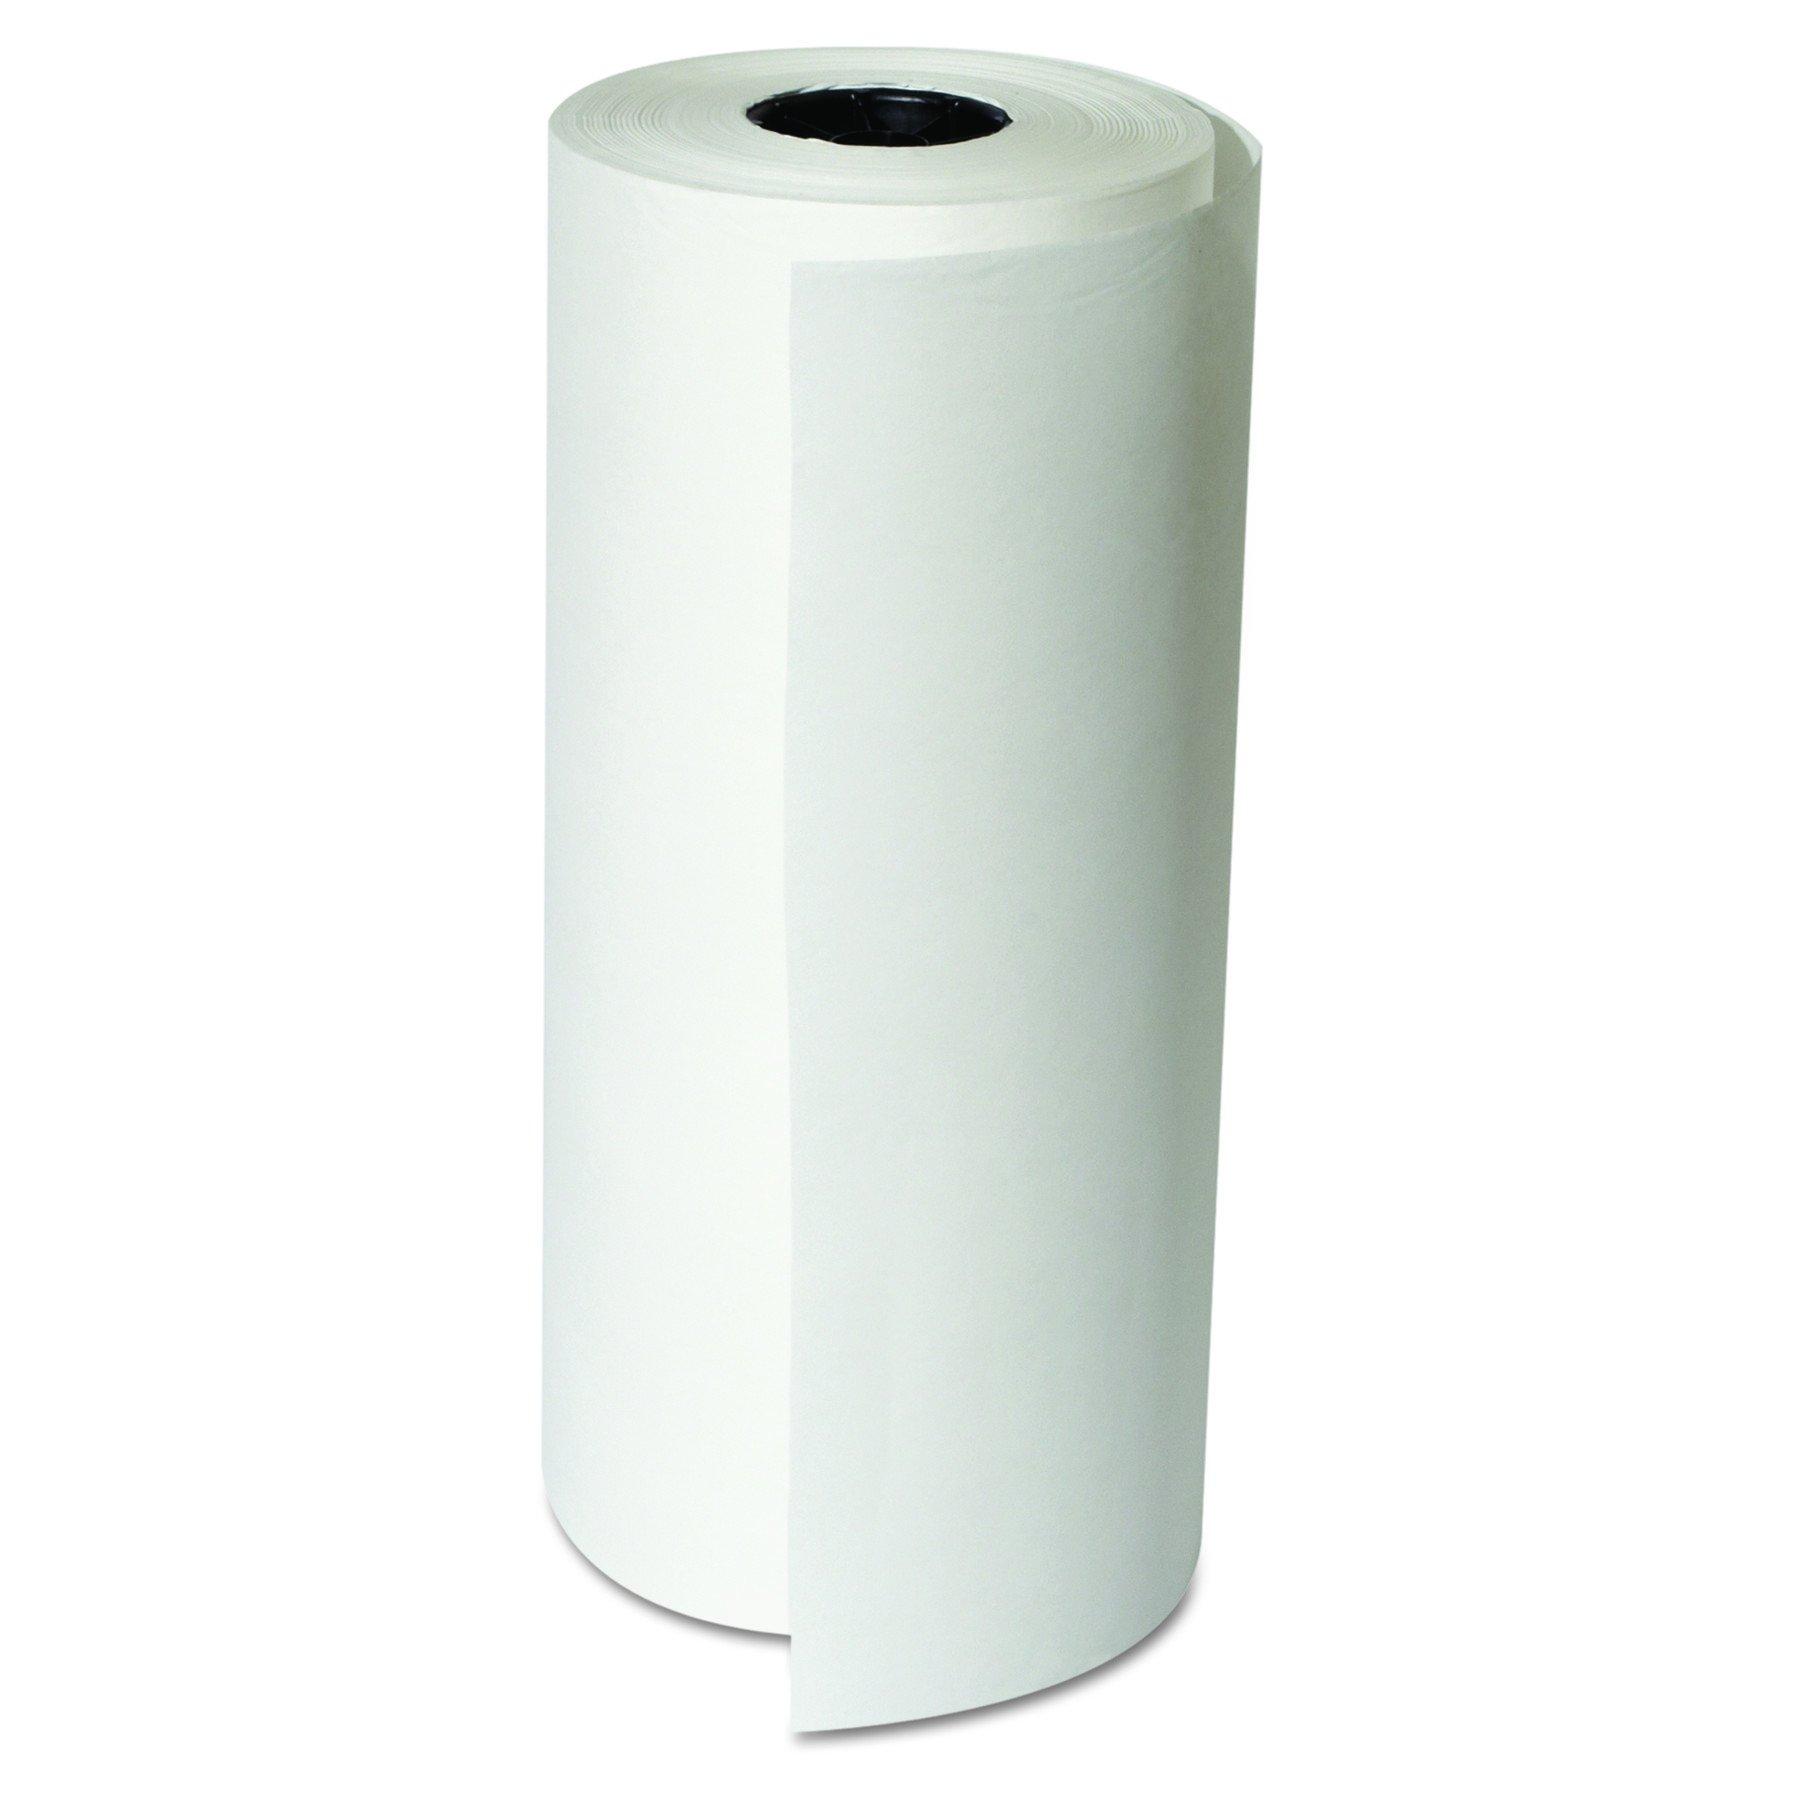 Boardwalk B3040900 Butcher Paper, 30'' x 900 ft, White Roll